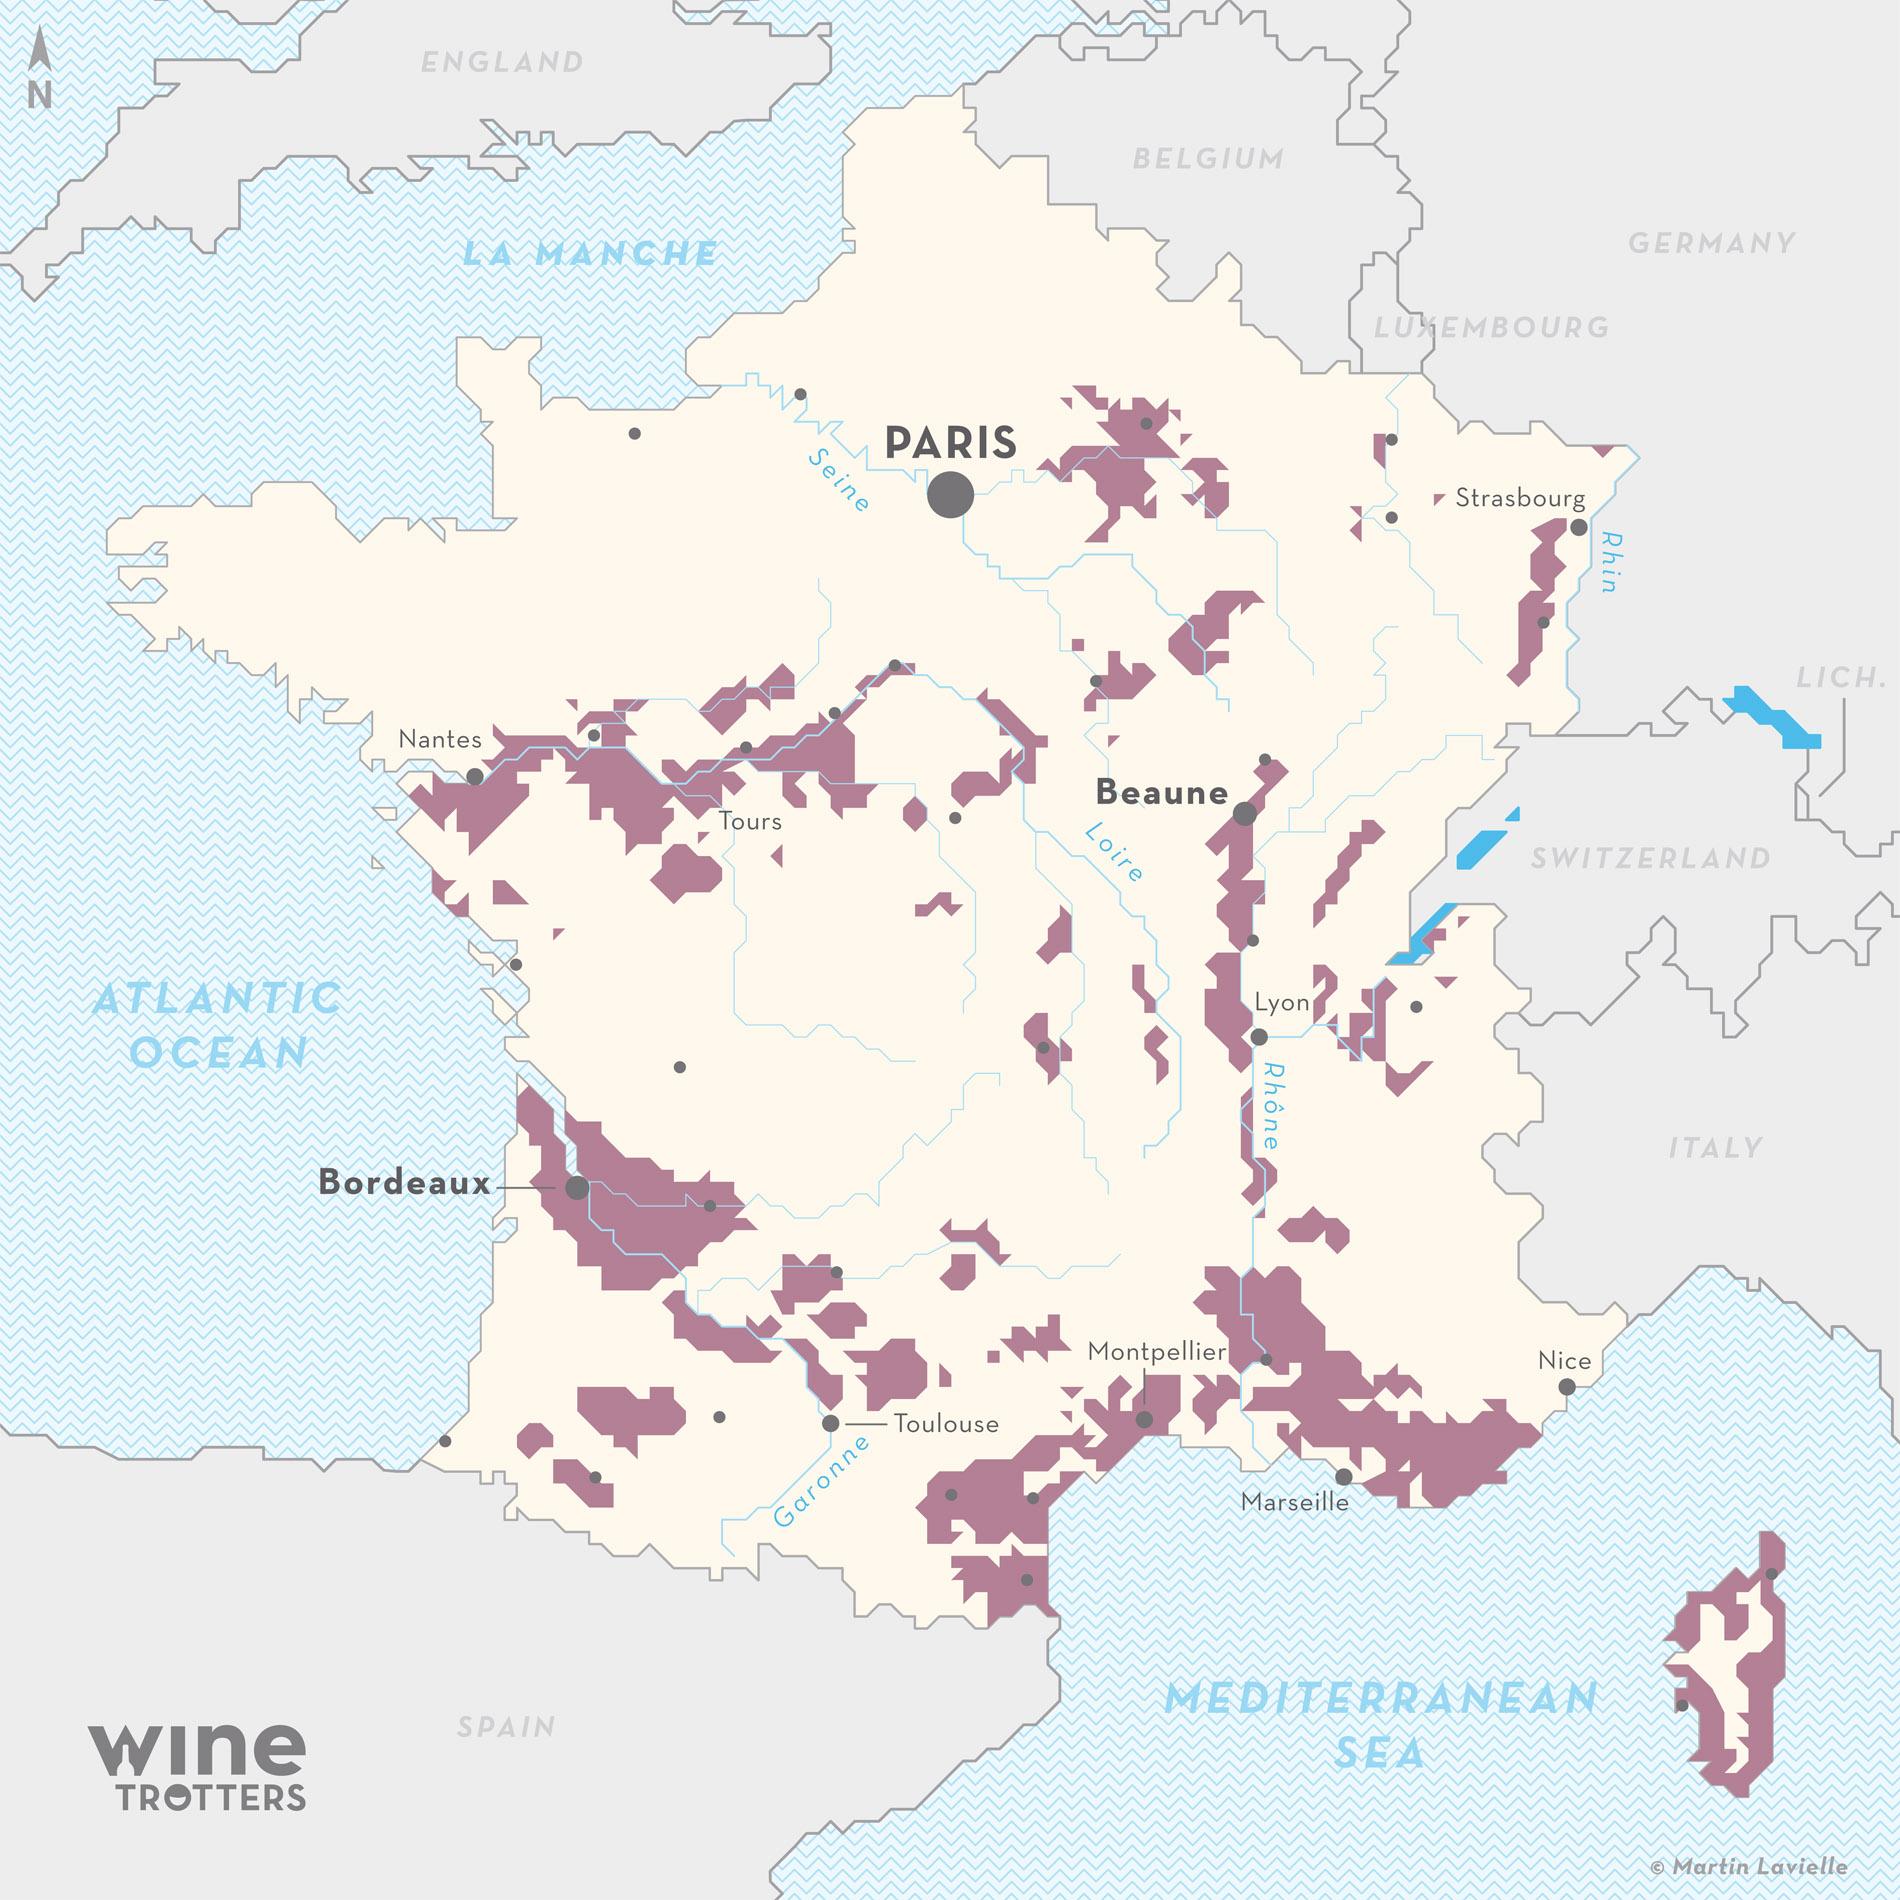 Wine-Trotters_wine-oenotourism_tourisme_map-wine_mapa-vino_carte-vin_4_WEB